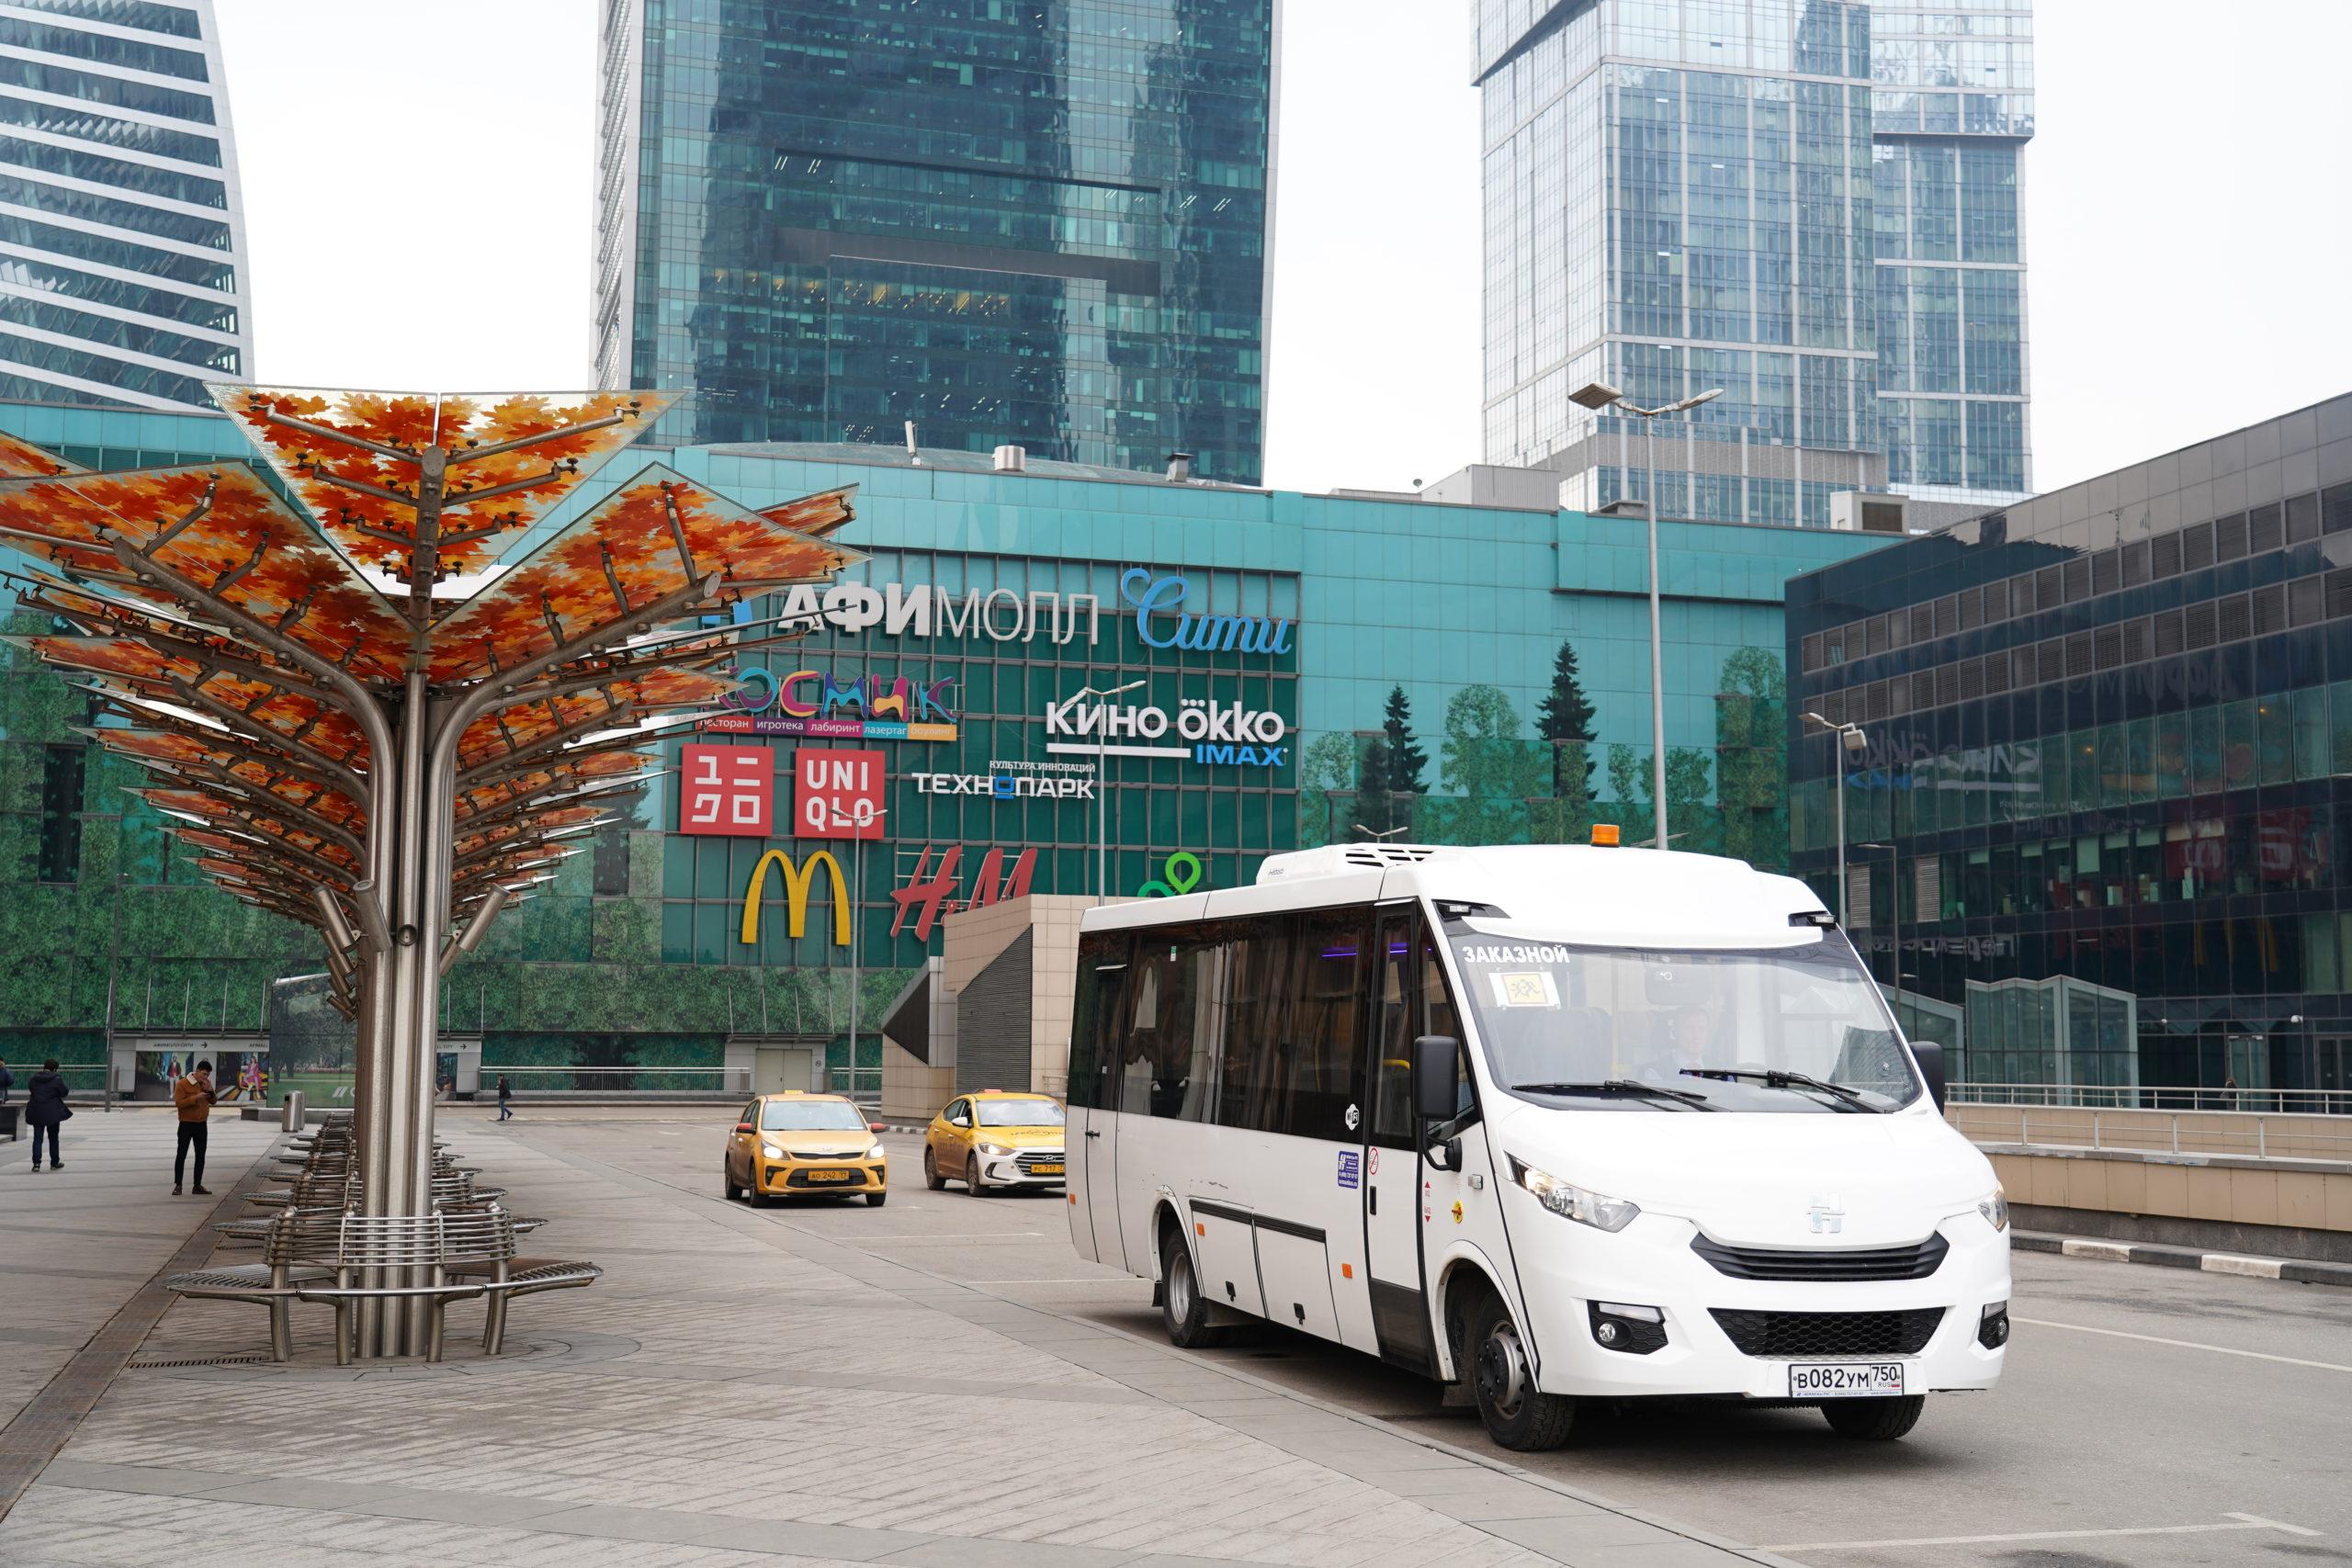 GLZ05561 scaled - Комфорт и удобство пассажирских перевозок от РесБизнесАвто